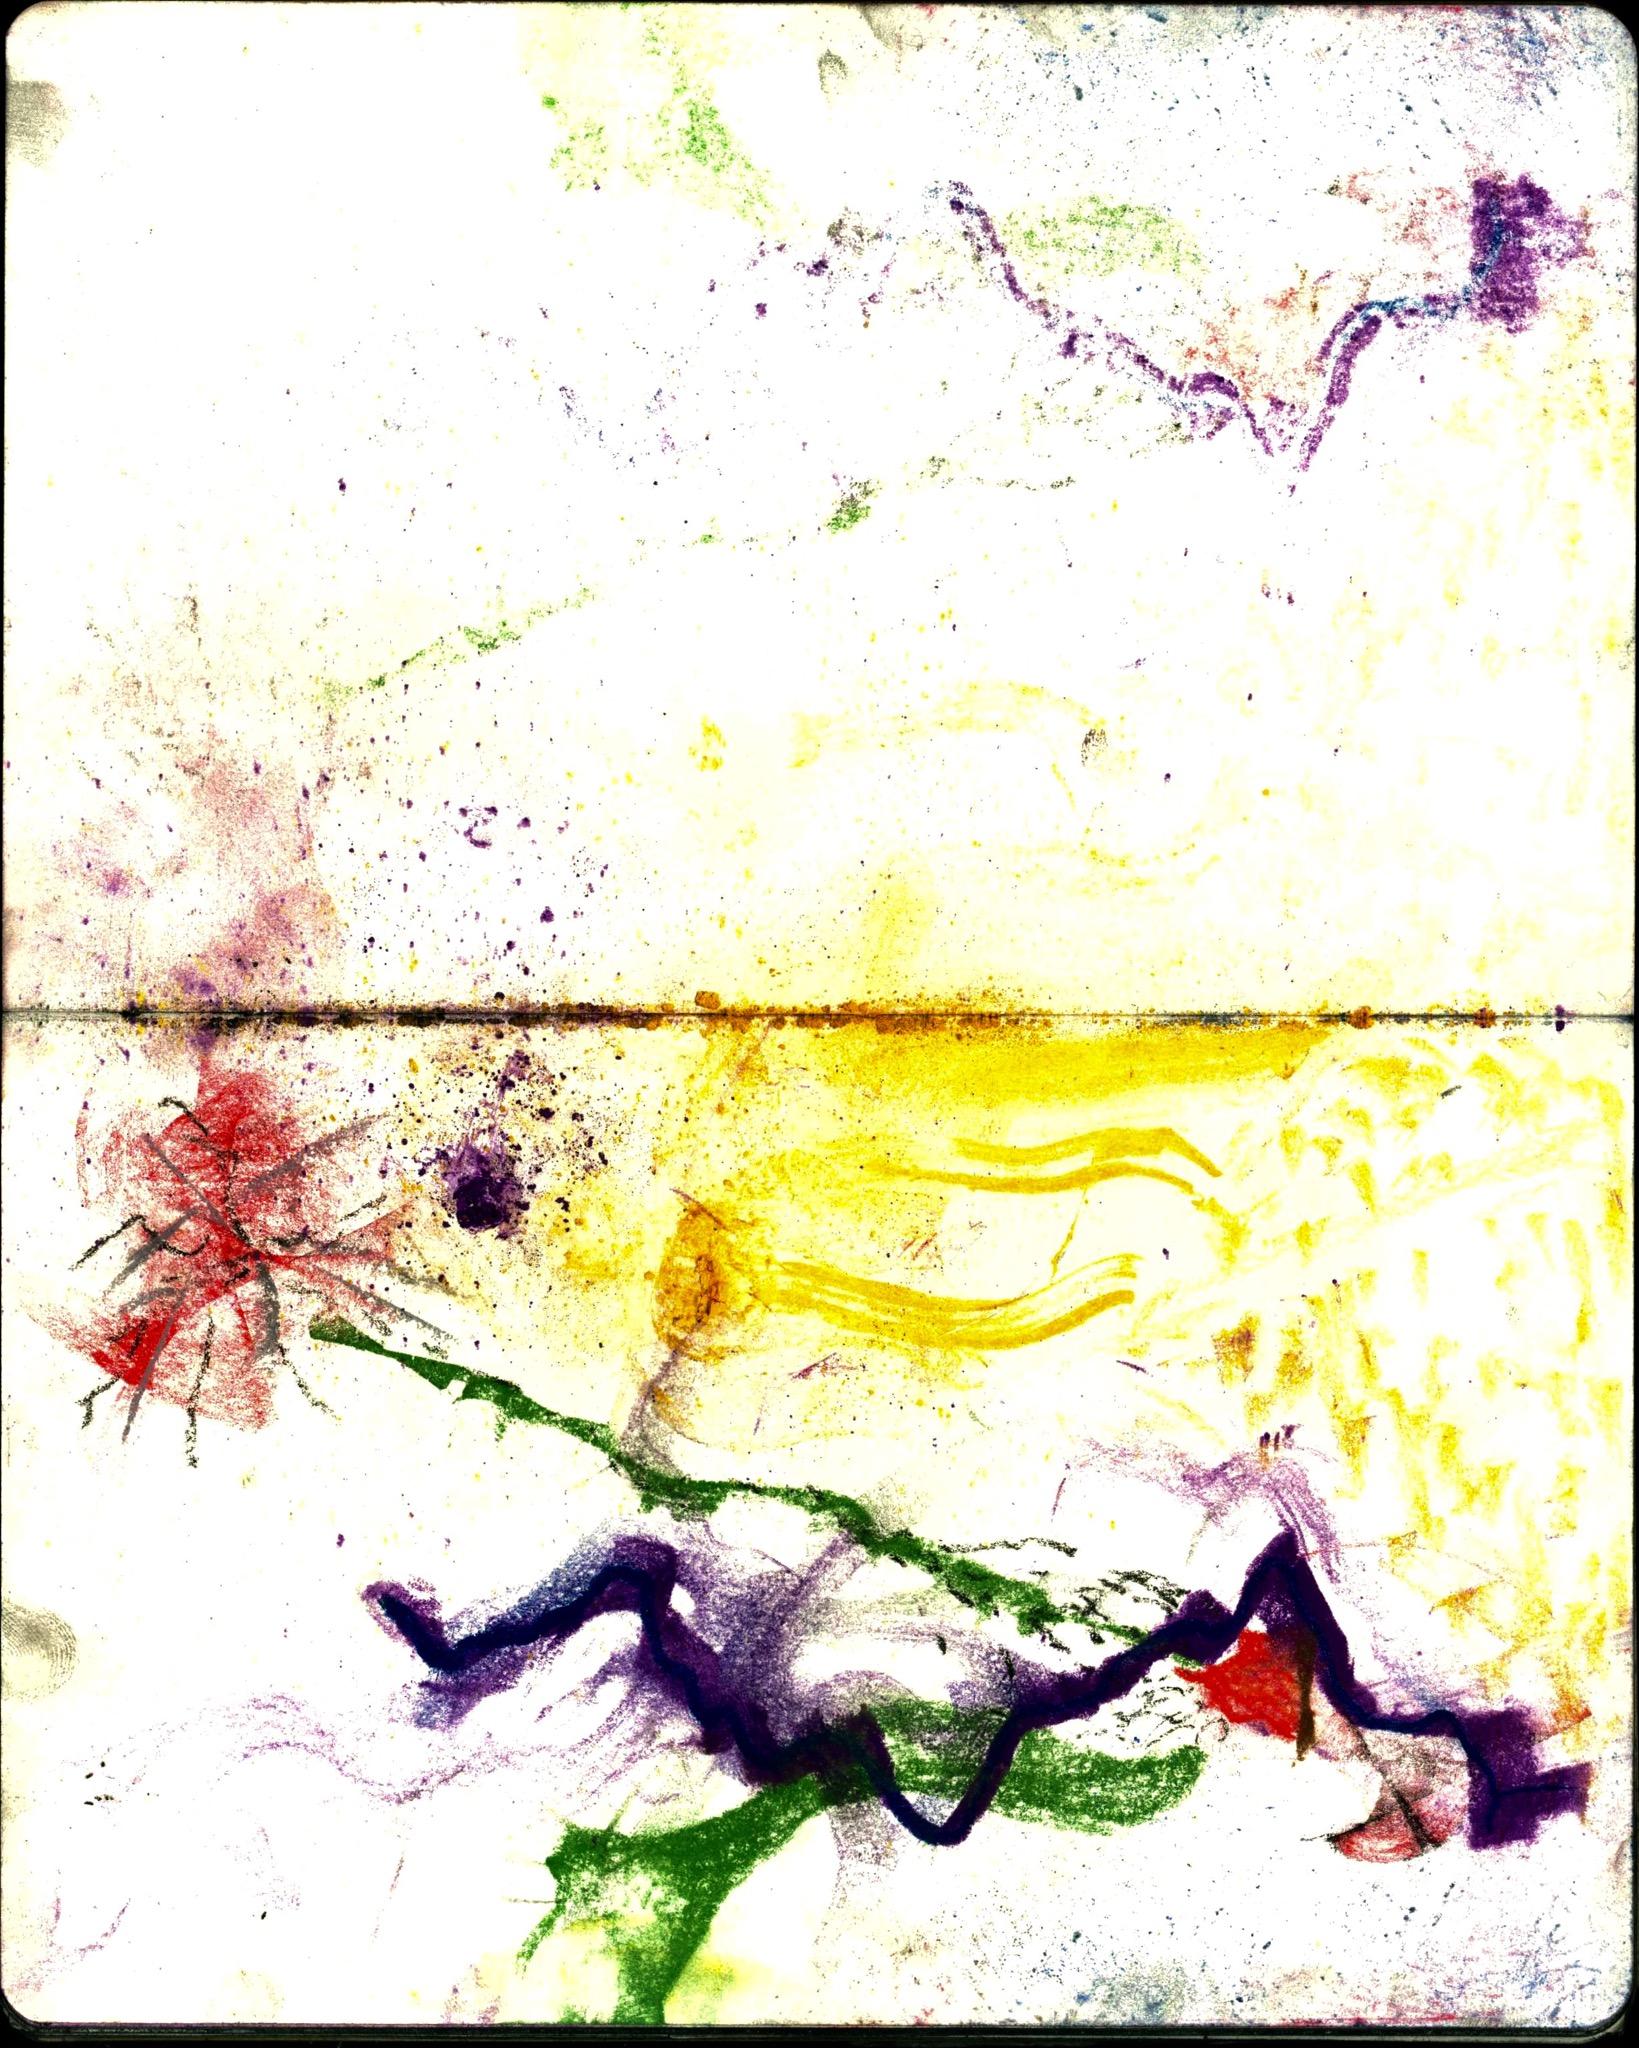 The reaction mixture; an emotion, a politic, a molecule